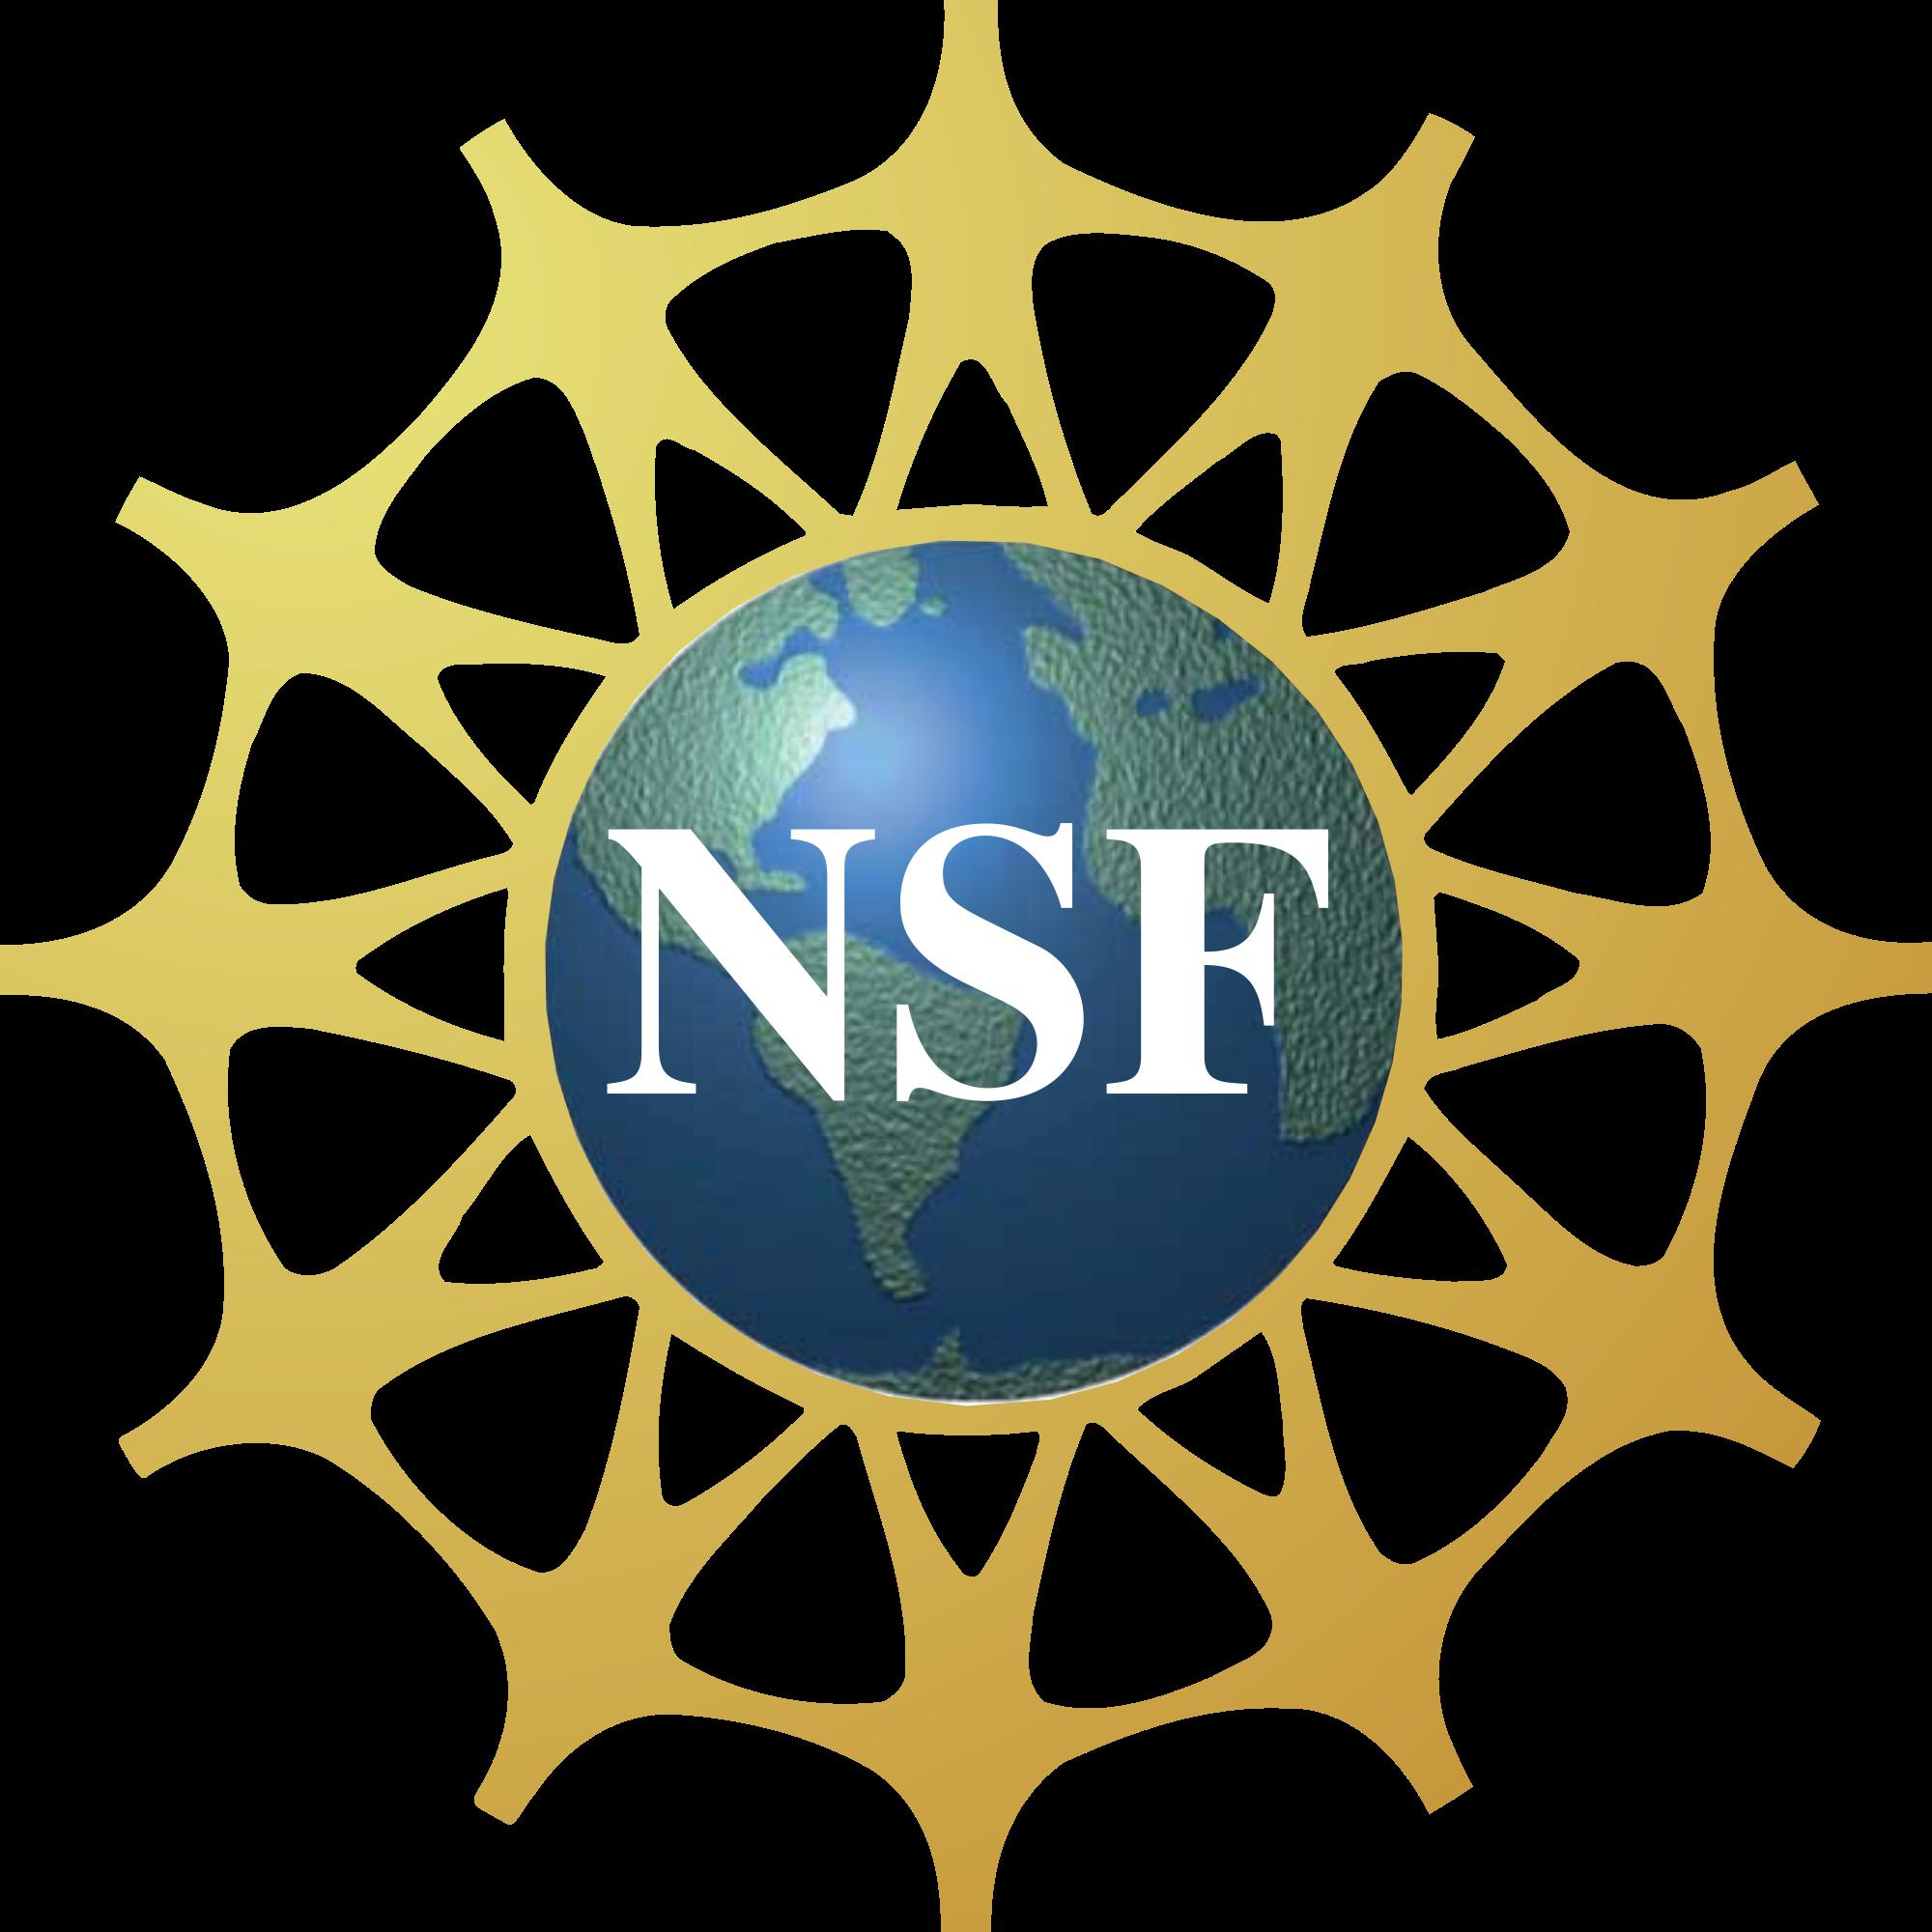 National Science Foundation logo (image)